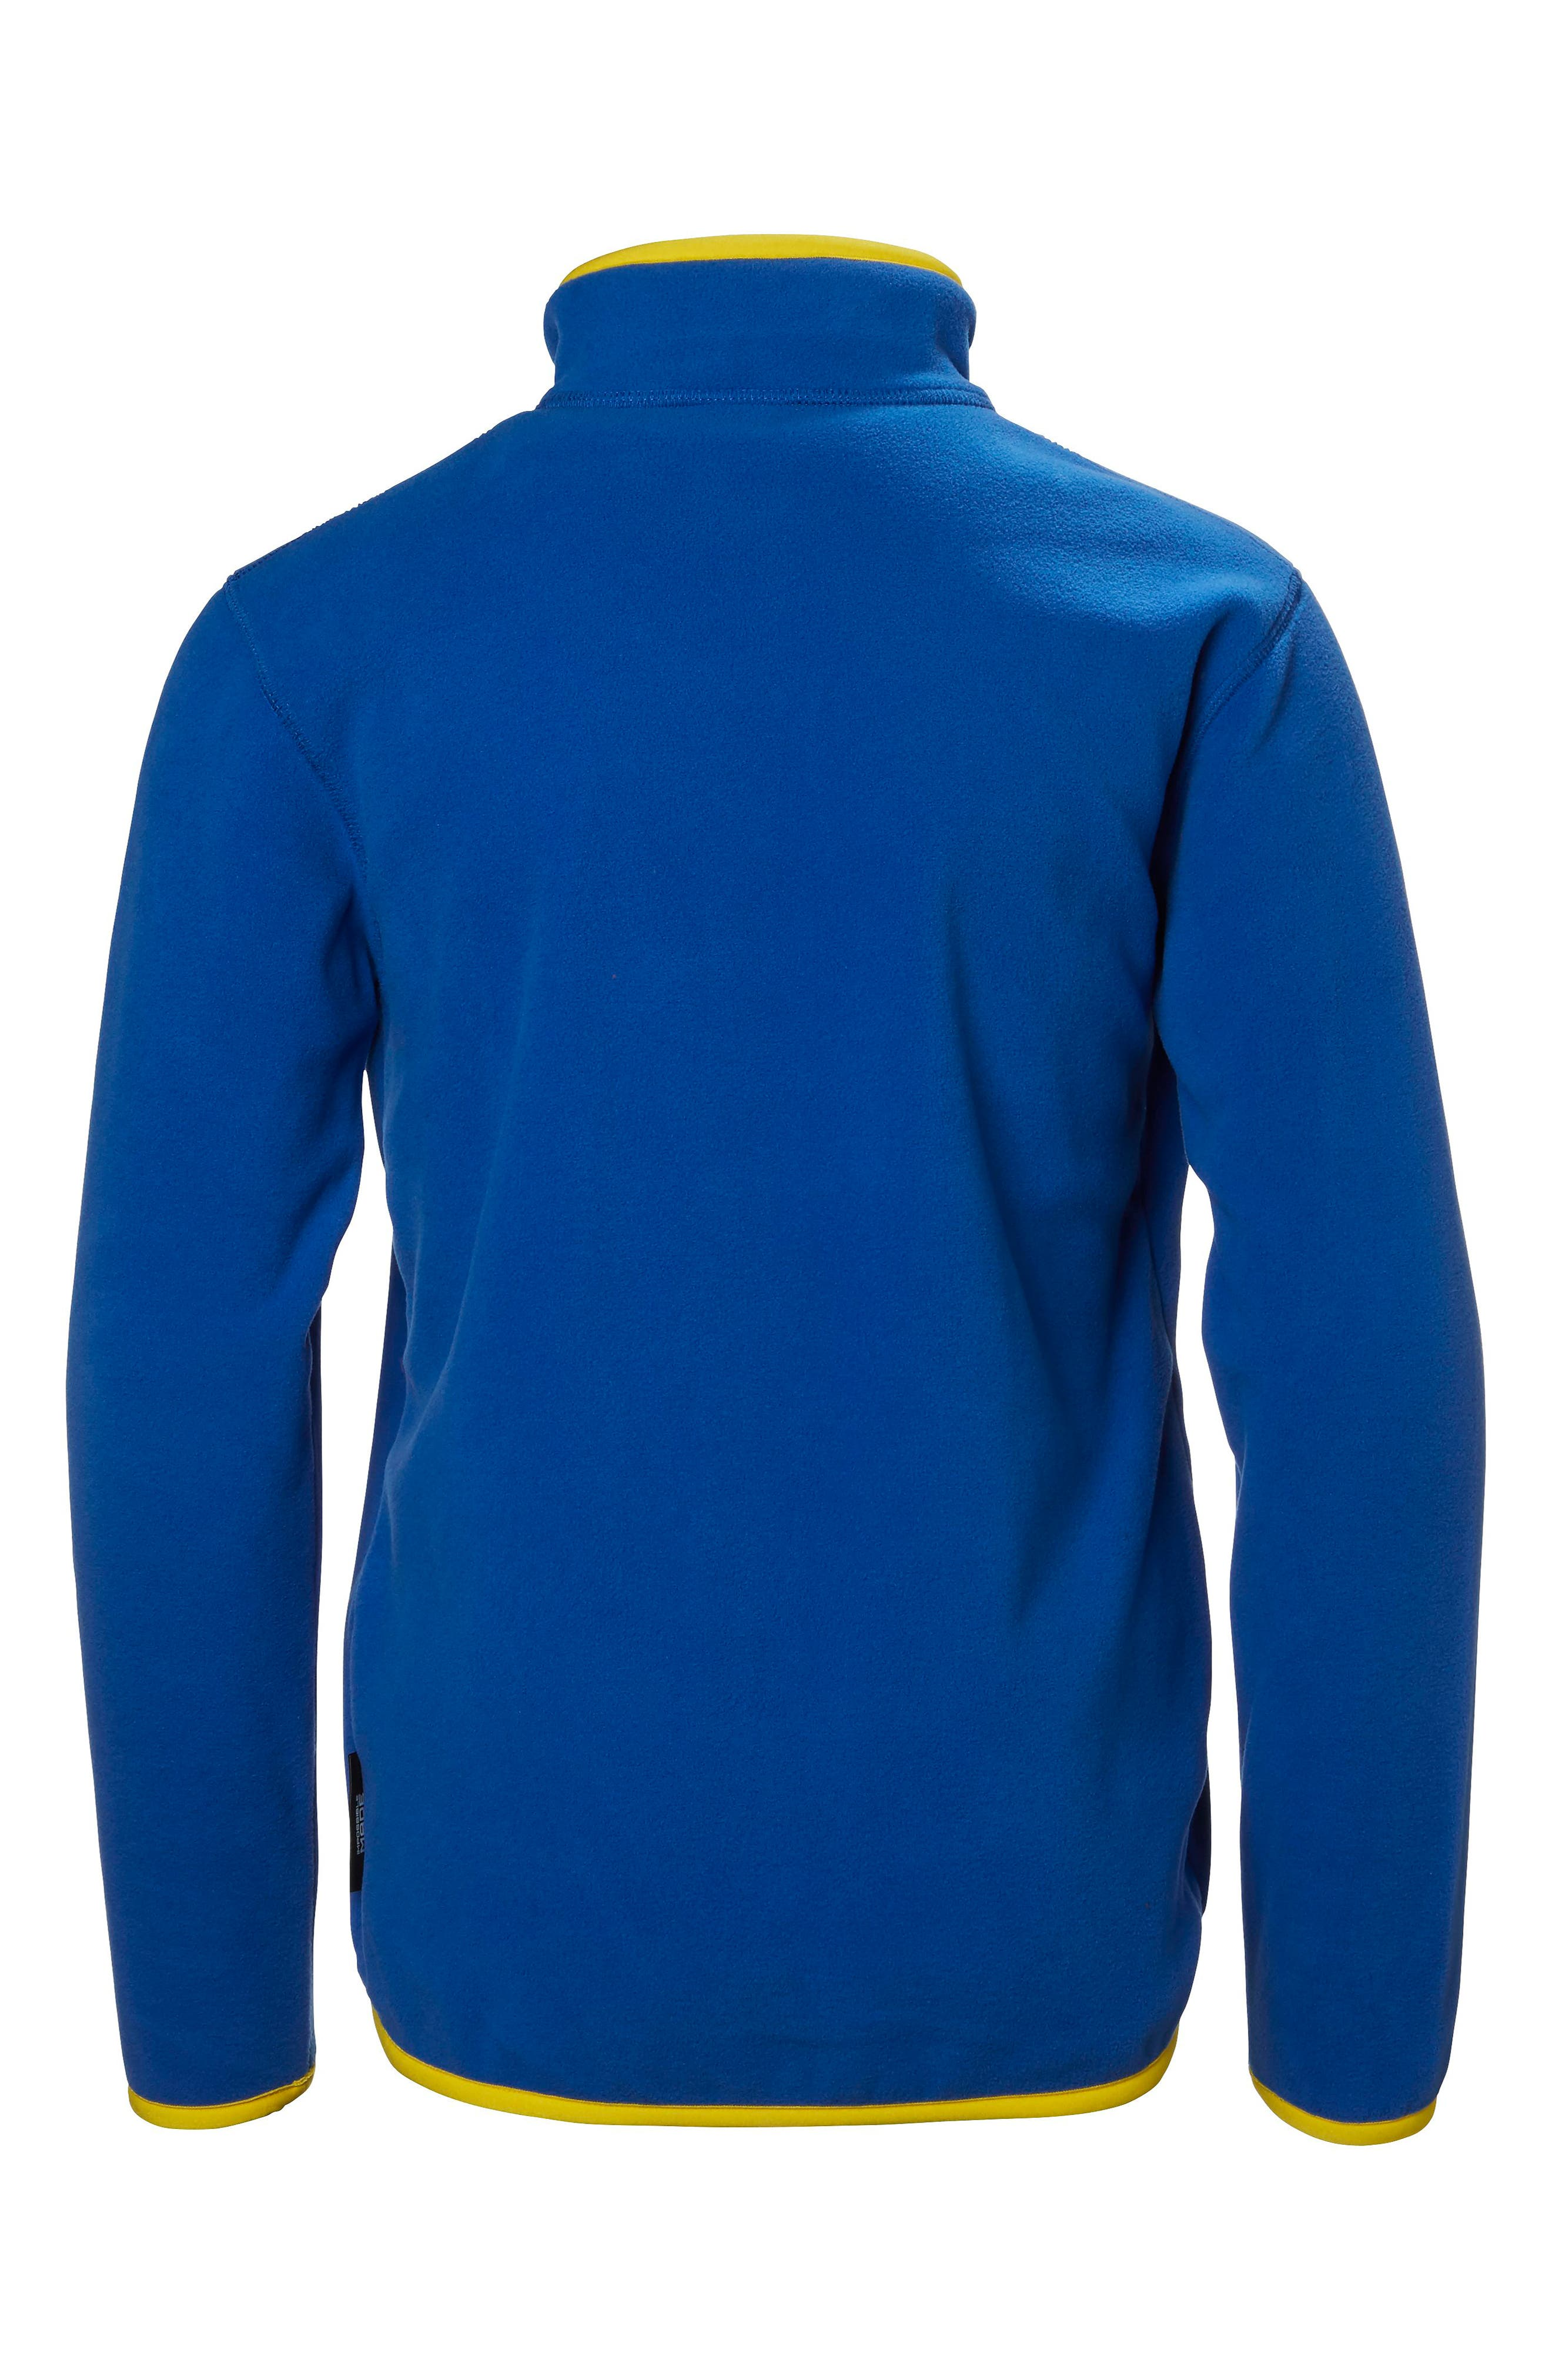 Jr. Daybreaker Polartec<sup>®</sup> Fleece Jacket,                             Alternate thumbnail 2, color,                             403